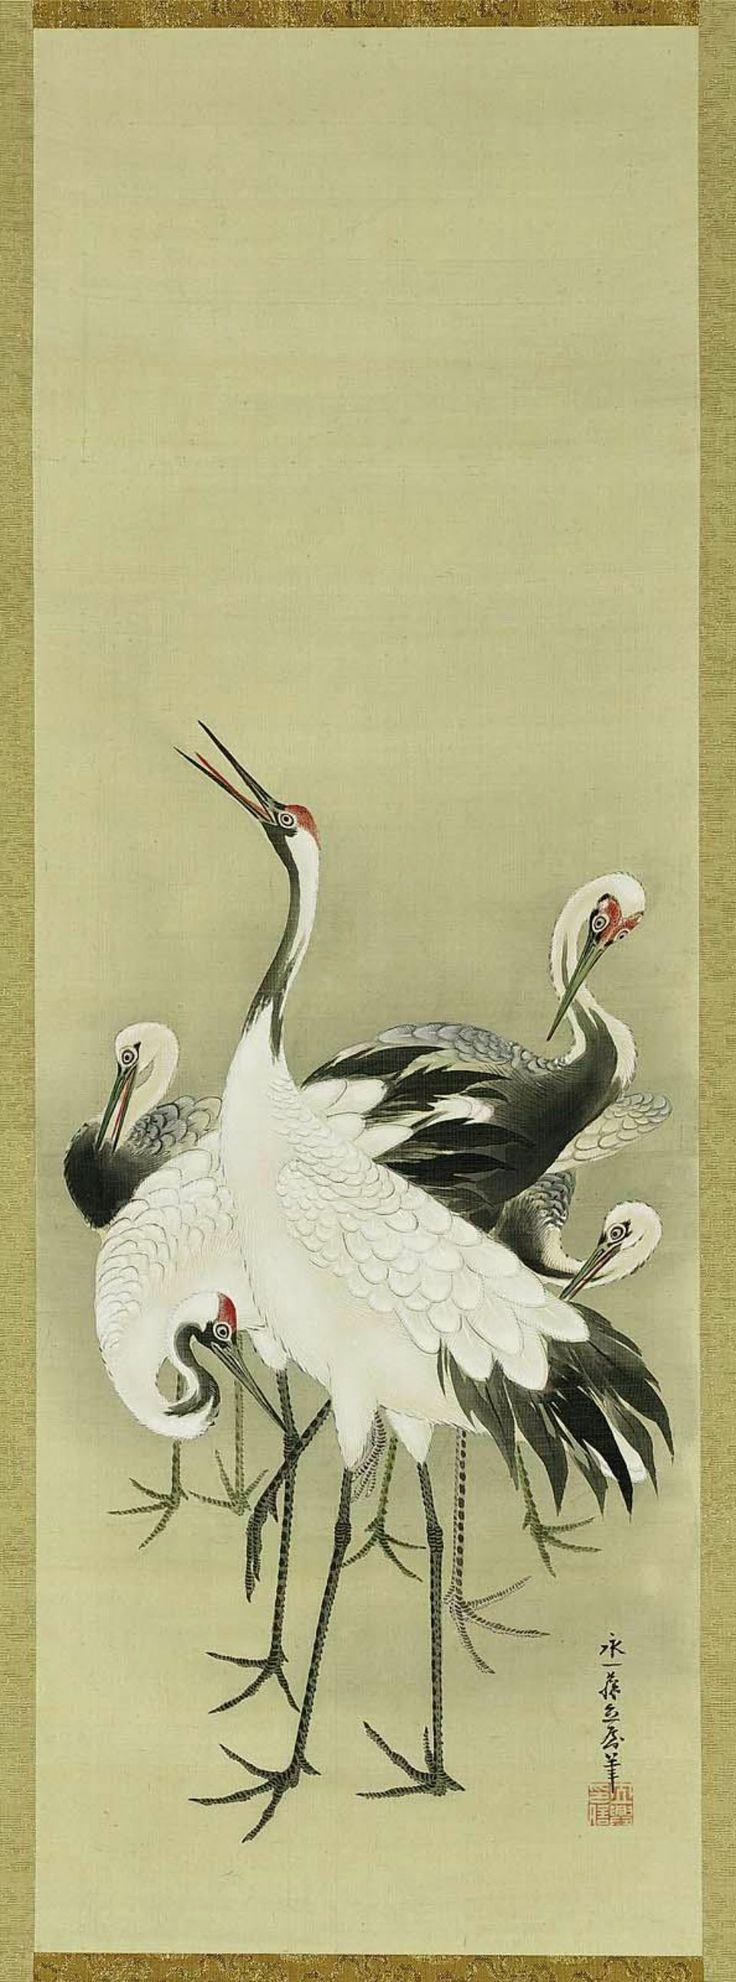 Cranes      鶴図      Japanese, Edo period - Meiji era, 19th century     Eiitsu, Japanese, dates unknown